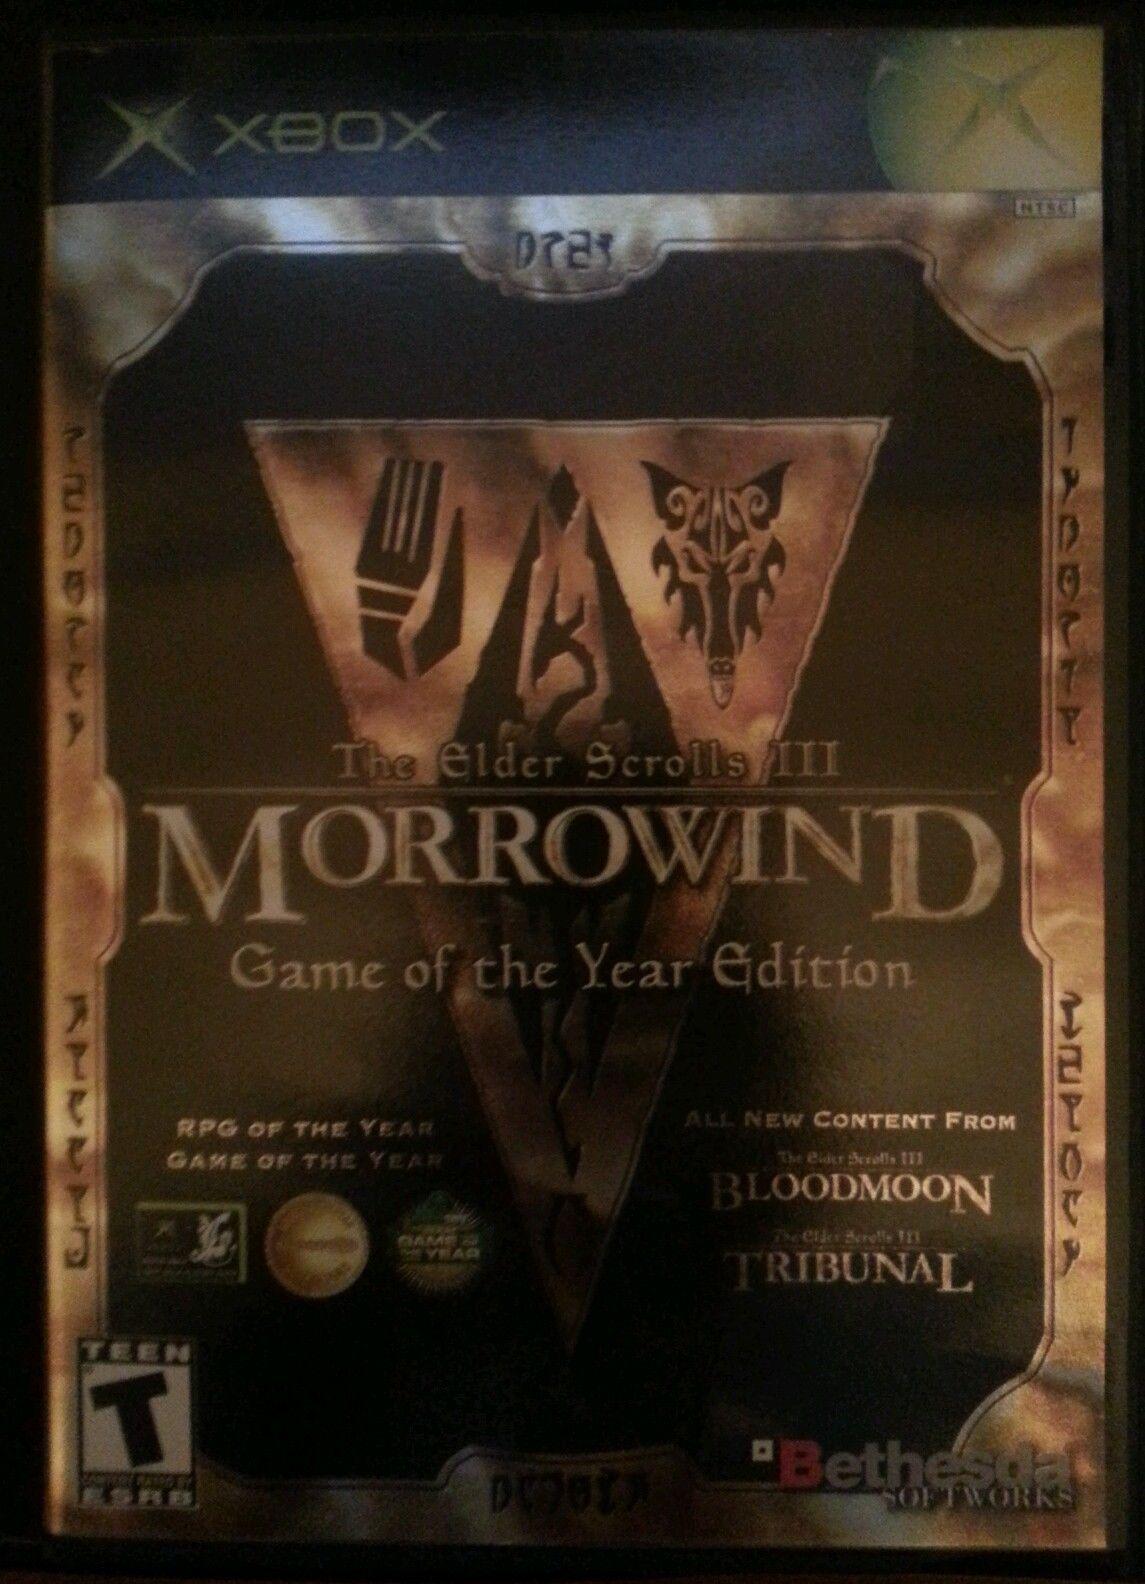 Elder Scrolls III: Morrowind -- Game of the Year Edition  (Xbox, 2003)